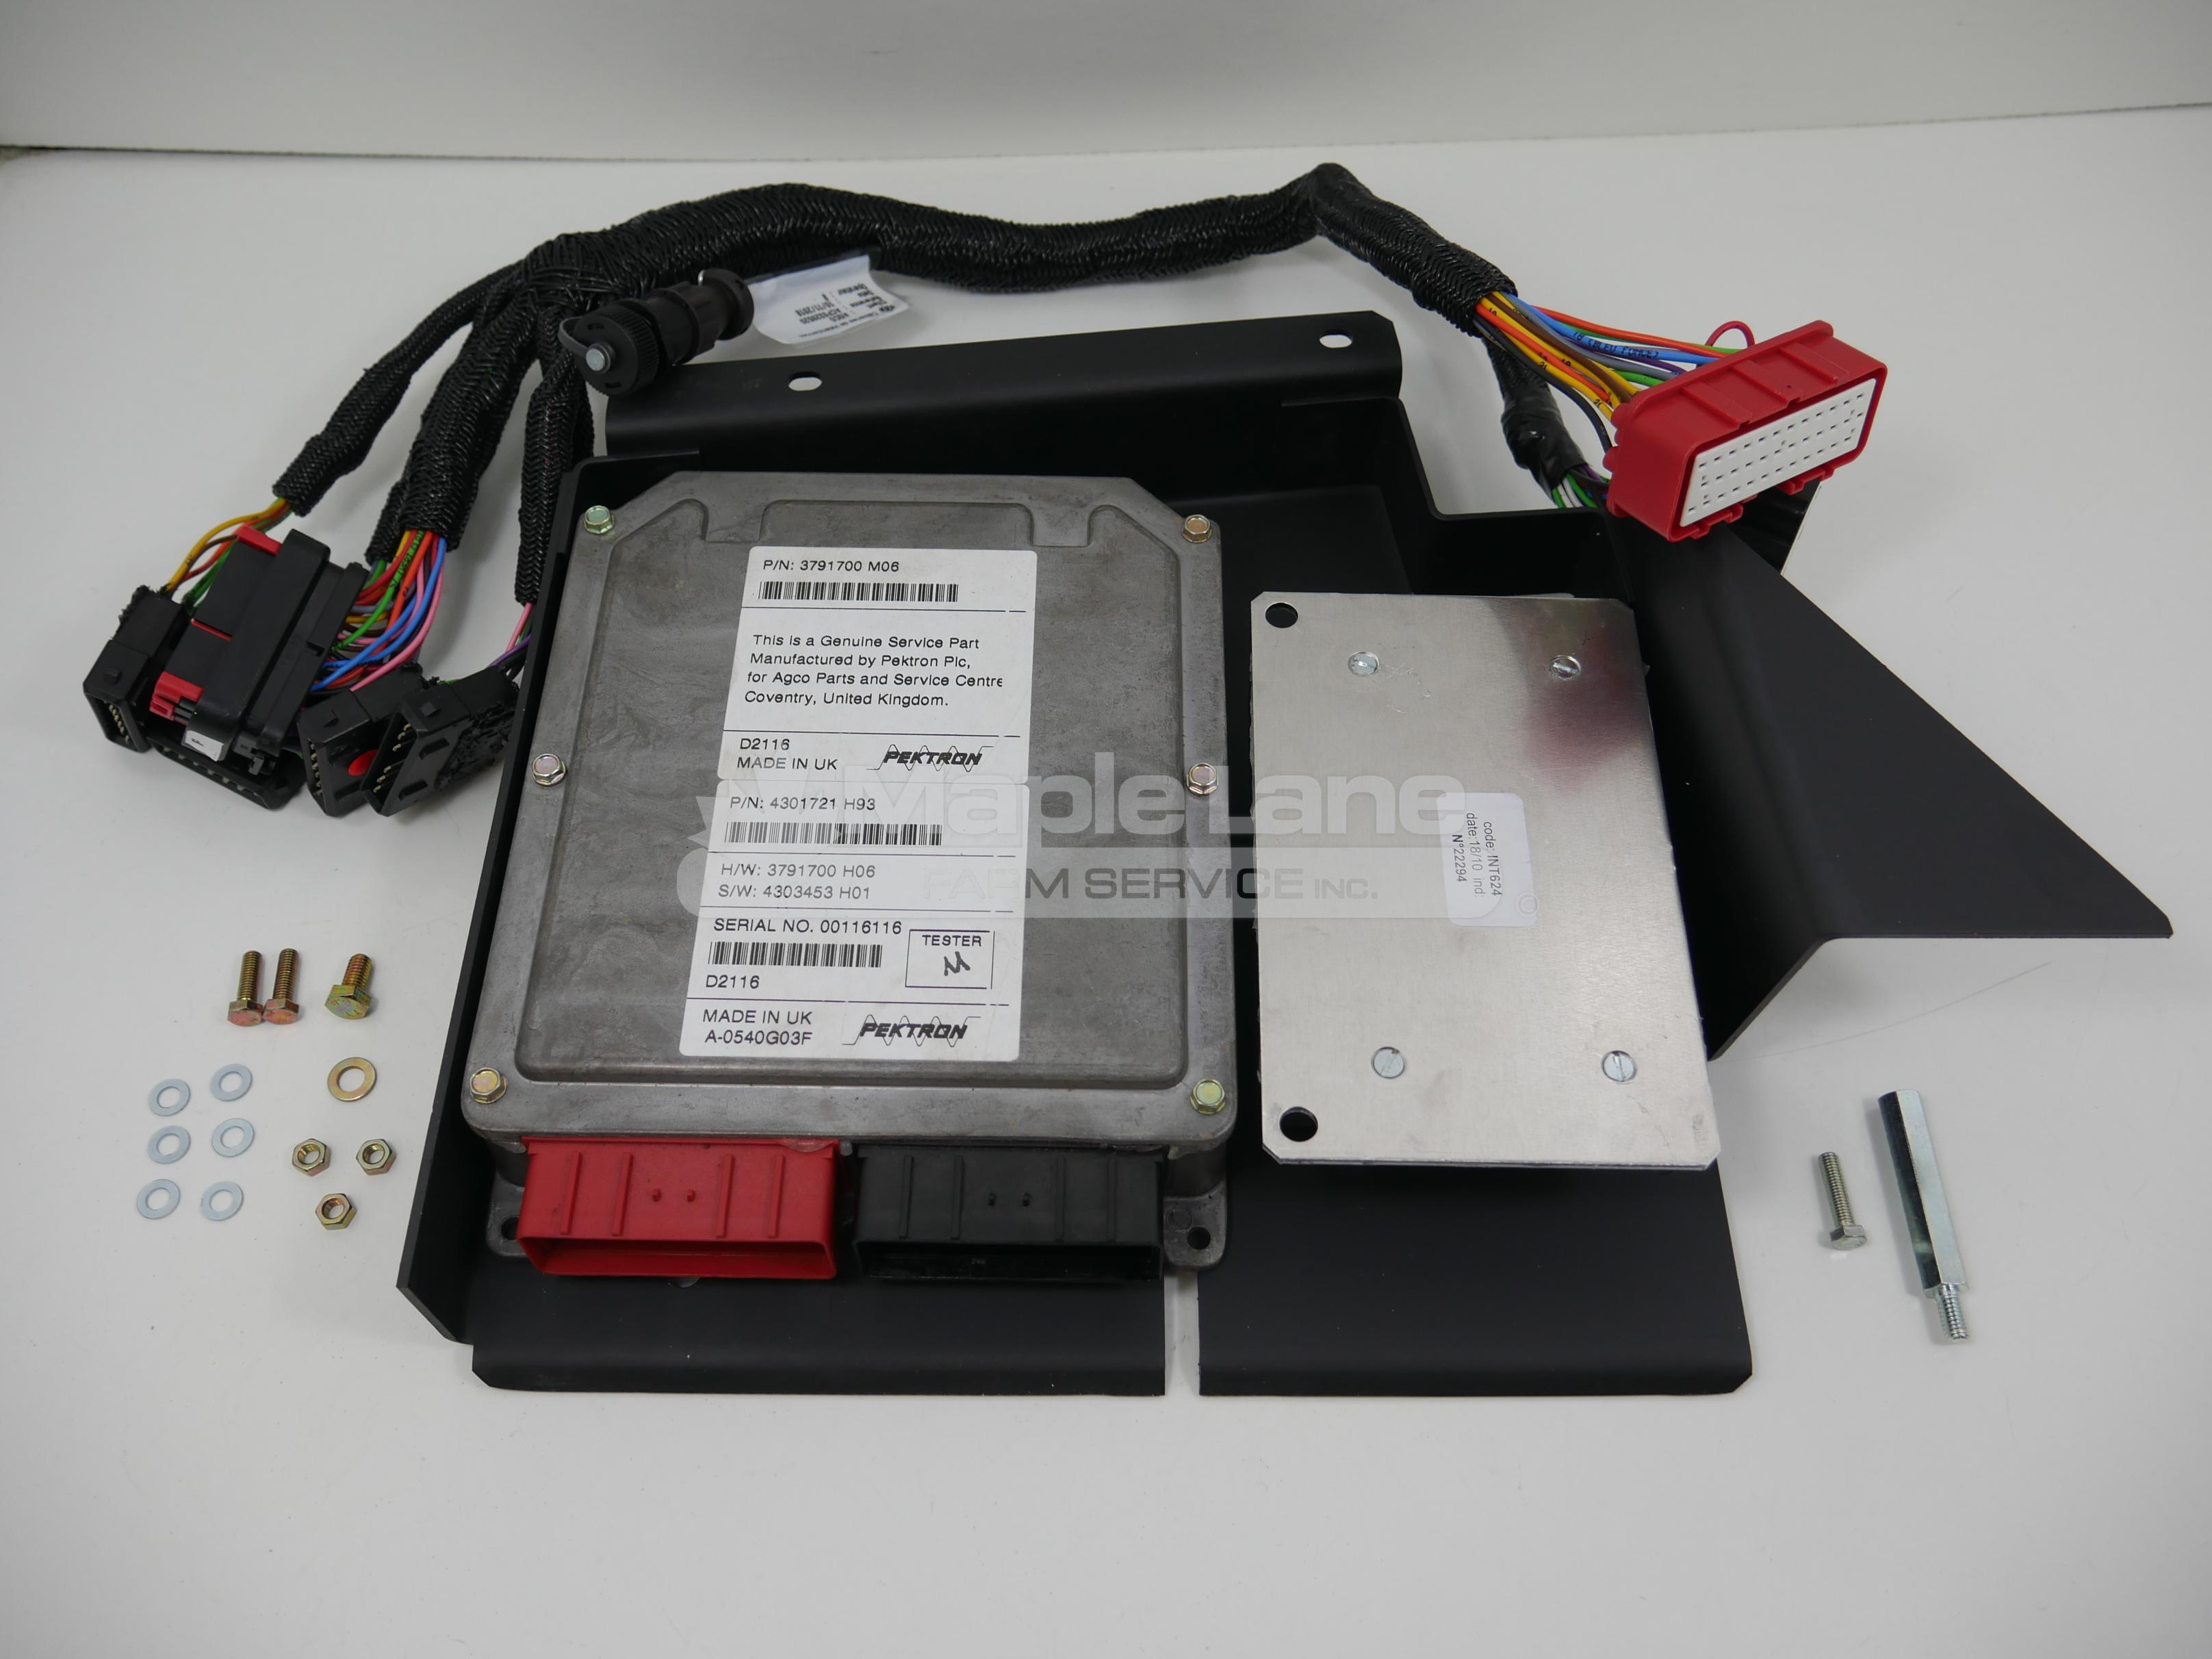 4270725M12 ECU and Wiring Harness